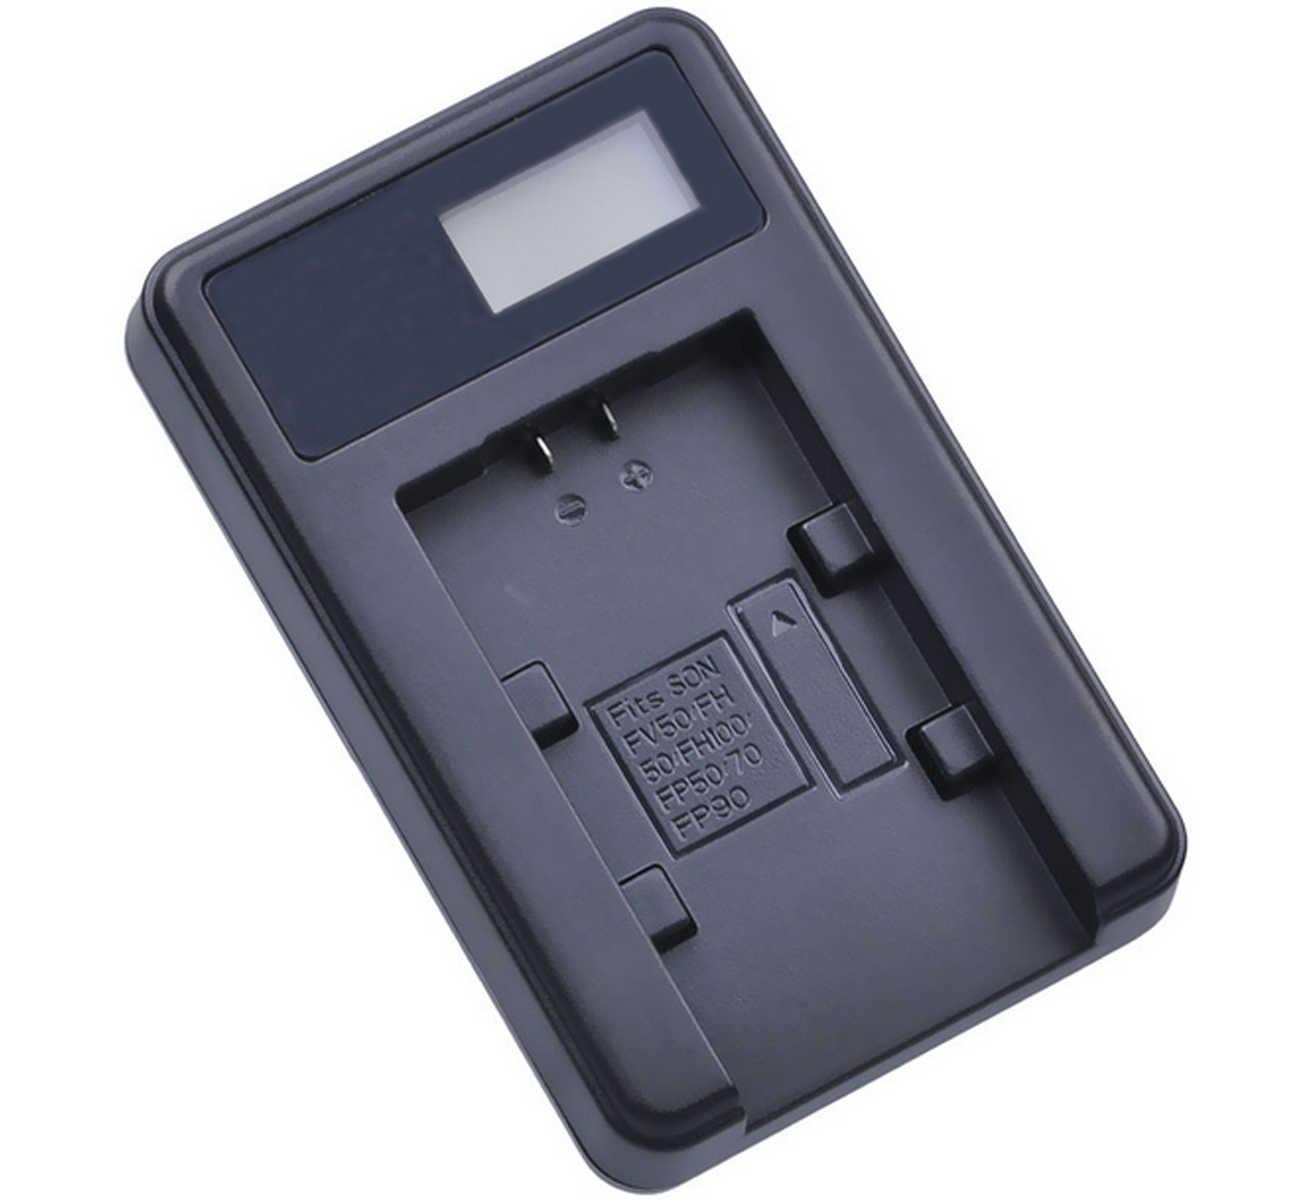 LCD USB Battery Charger for Sony DCR-HC16 DCR-HC18 DCR-HC17 DCR-HC19 Handycam Camcorder